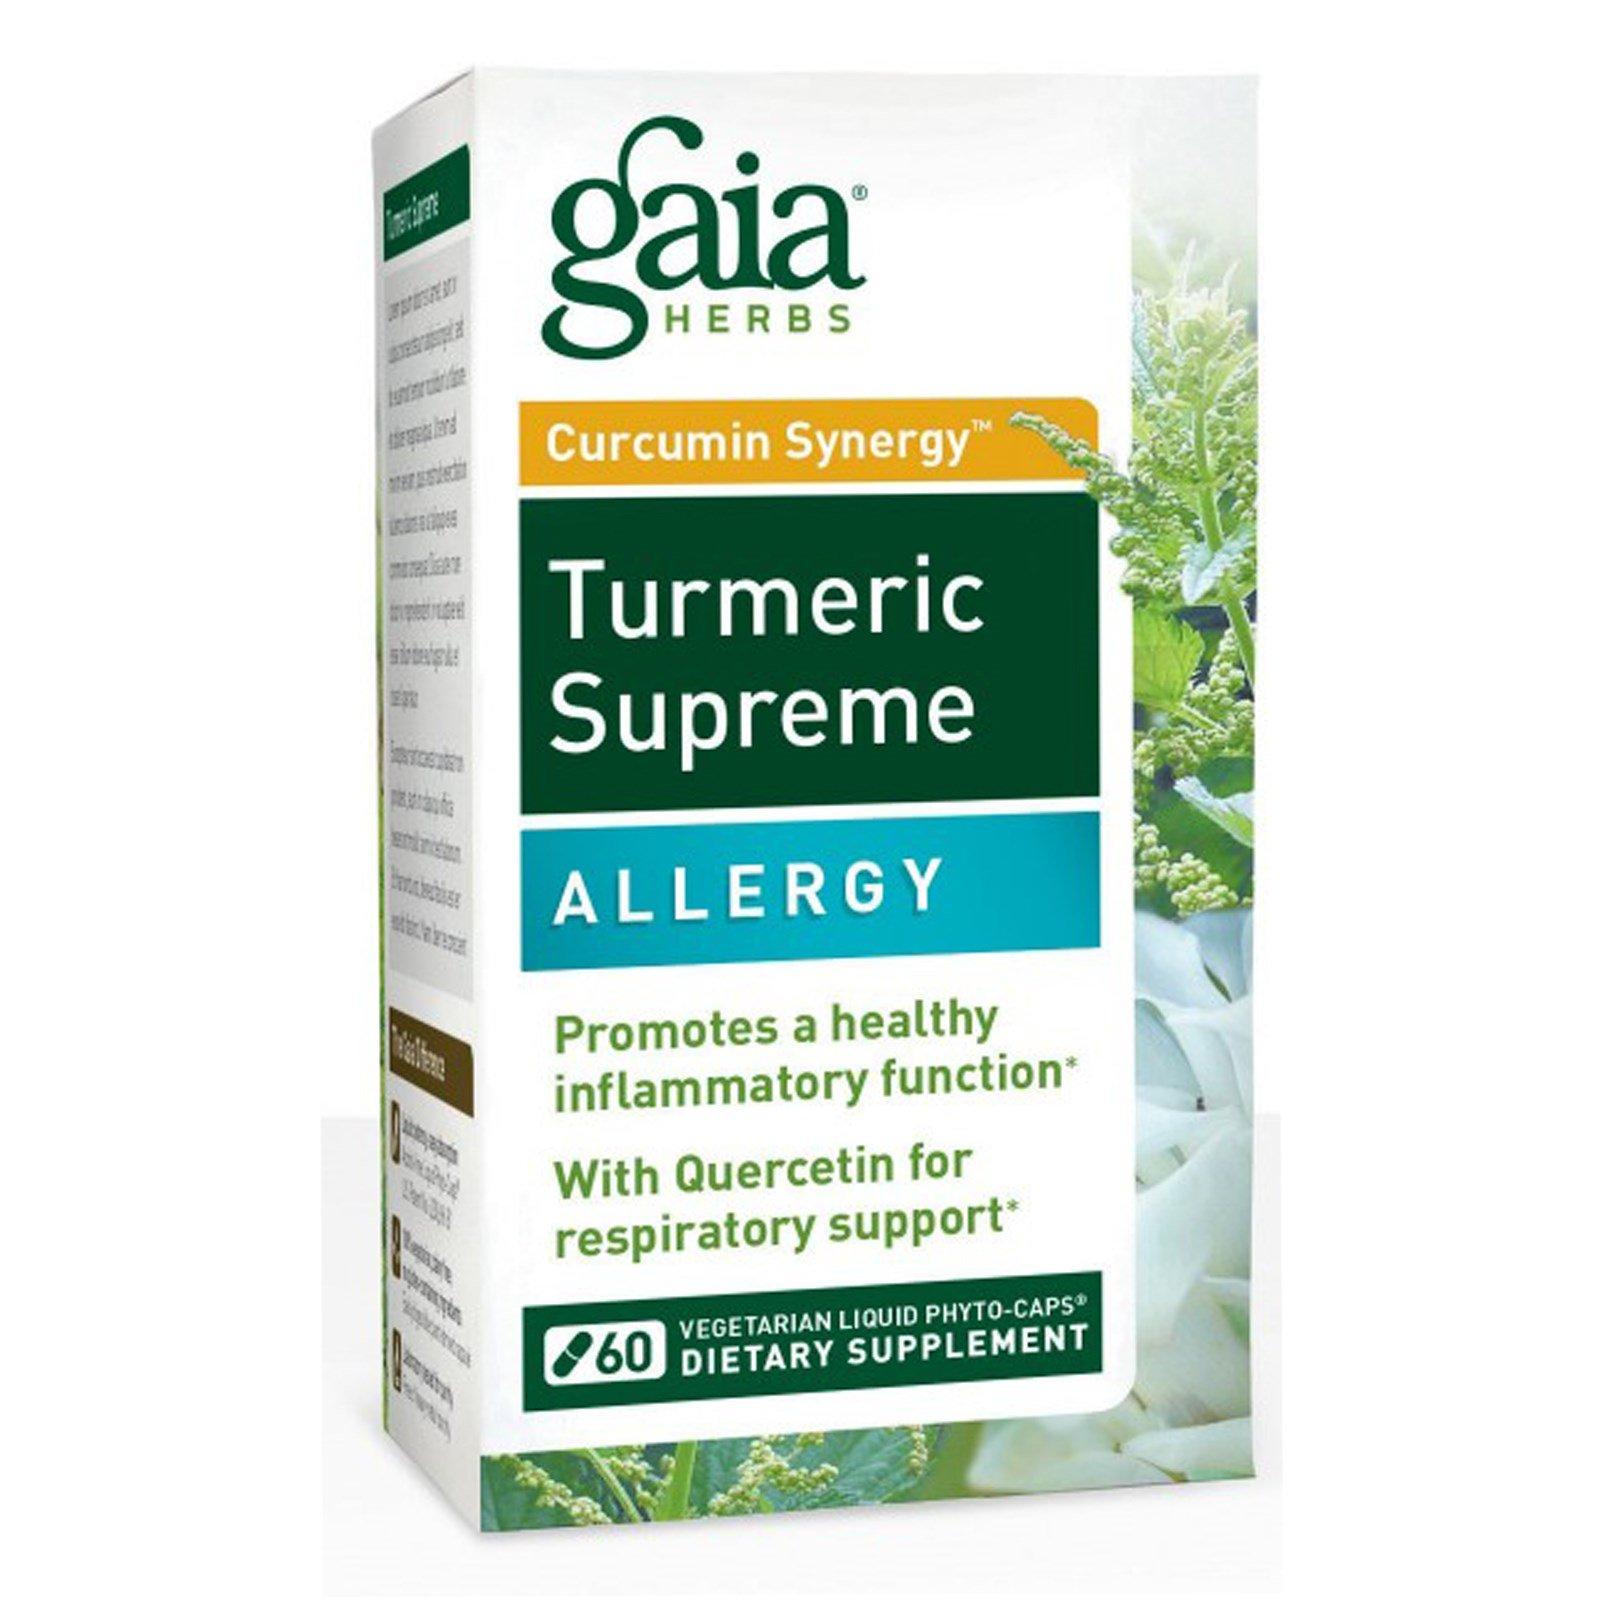 Gaia Herbs, Turmeric Supreme, Allergy, при аллергии, 60 вегетарианских жидких фитокапсул